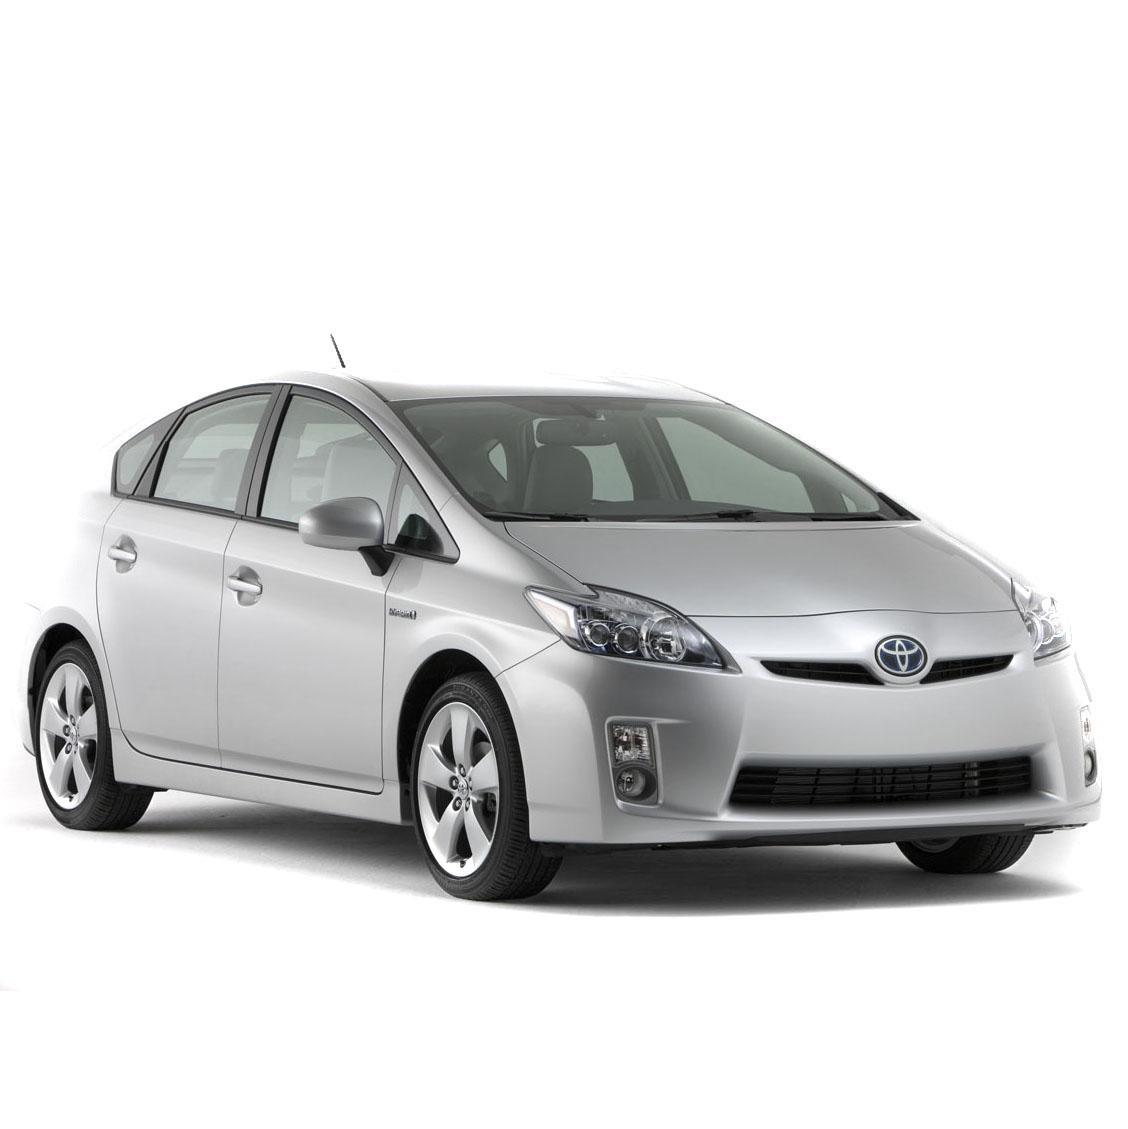 2009 Toyota Prius Car Mats